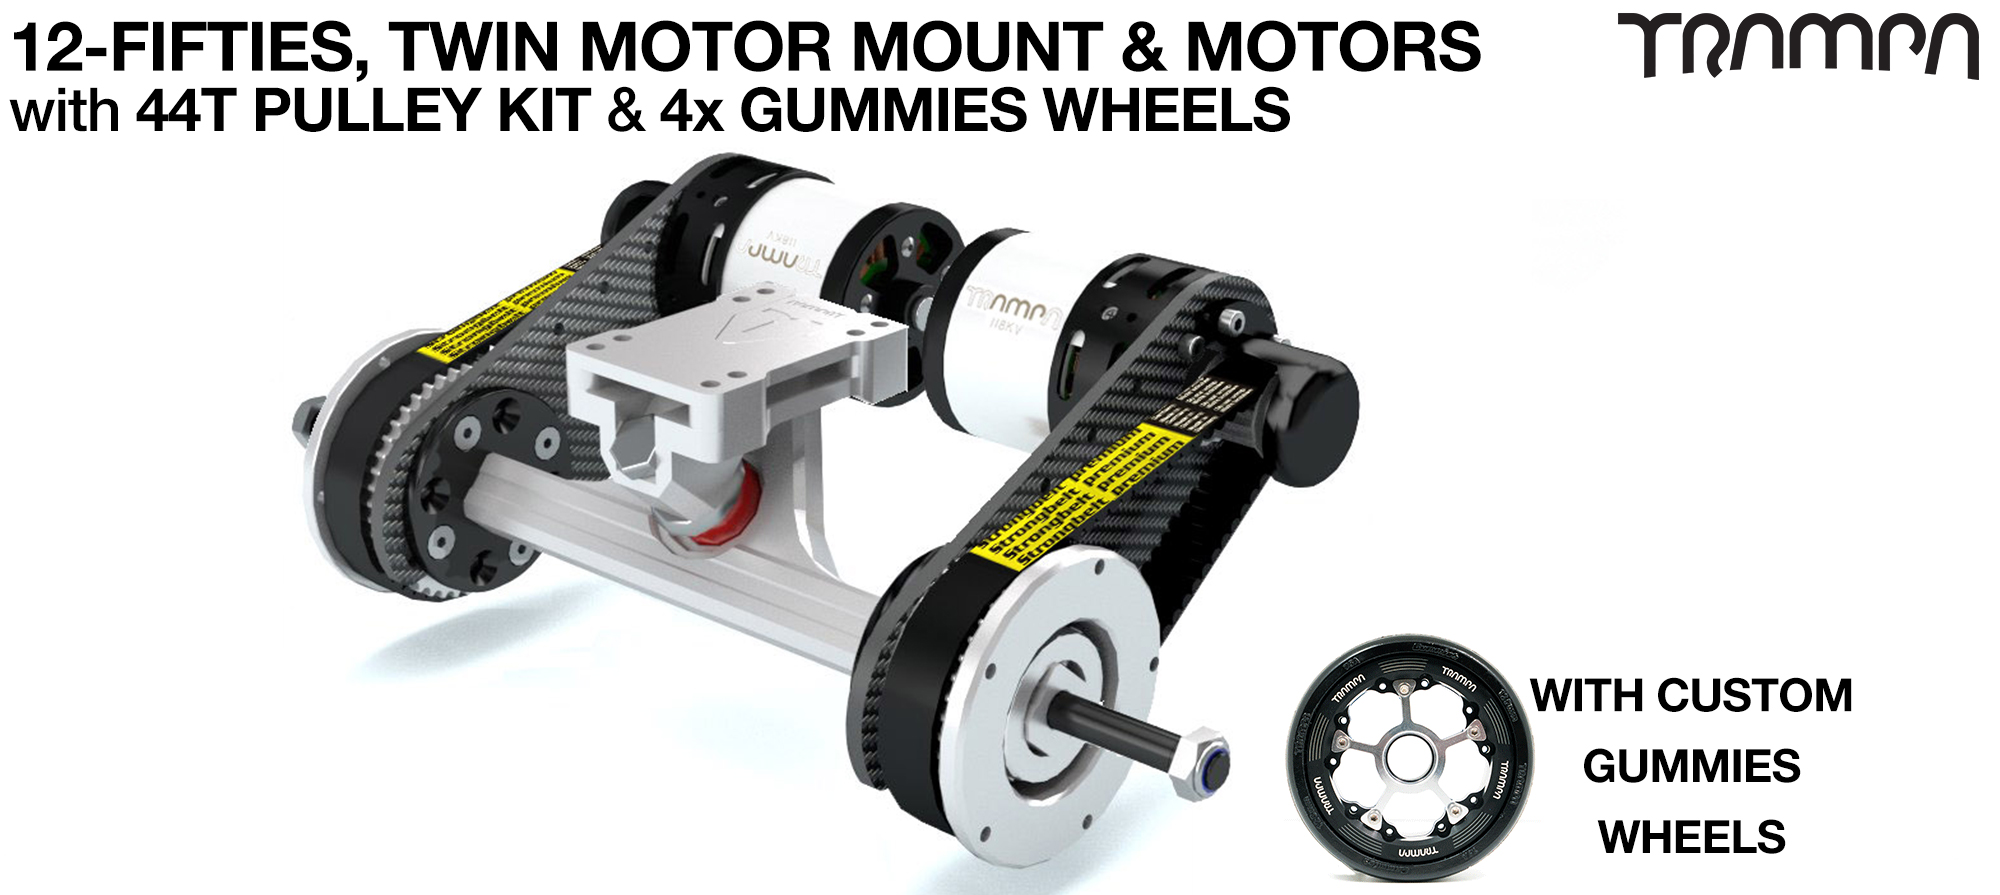 TWIN Original 12FiFties Motor mount & 44 Tooth Pulley Kit with MOTOR & 2x 12FiFties Trucks & 4x Gummies Wheels